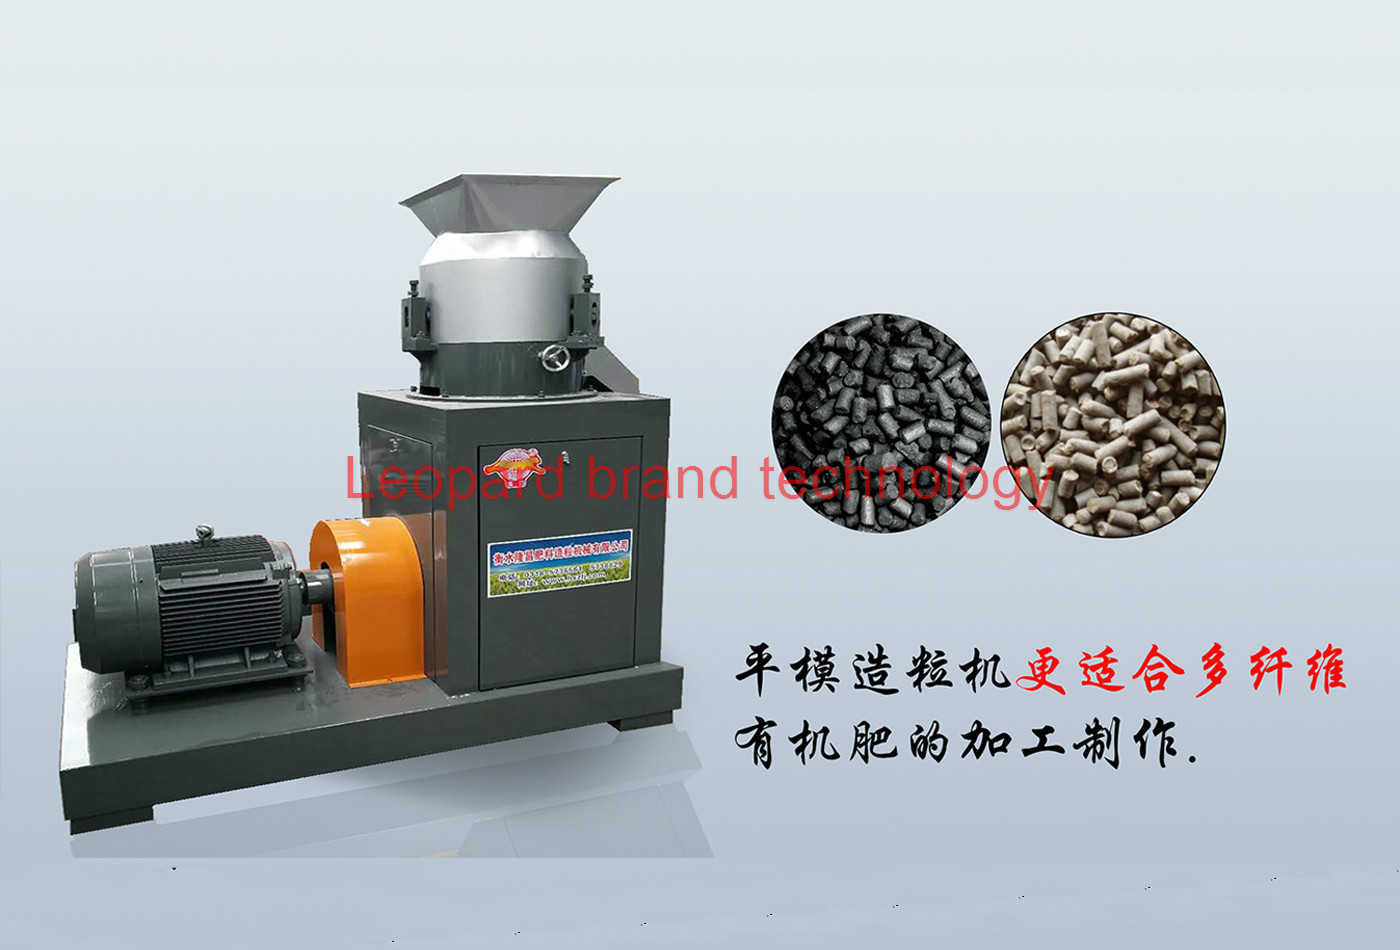 Flat-die extruding granulation unit